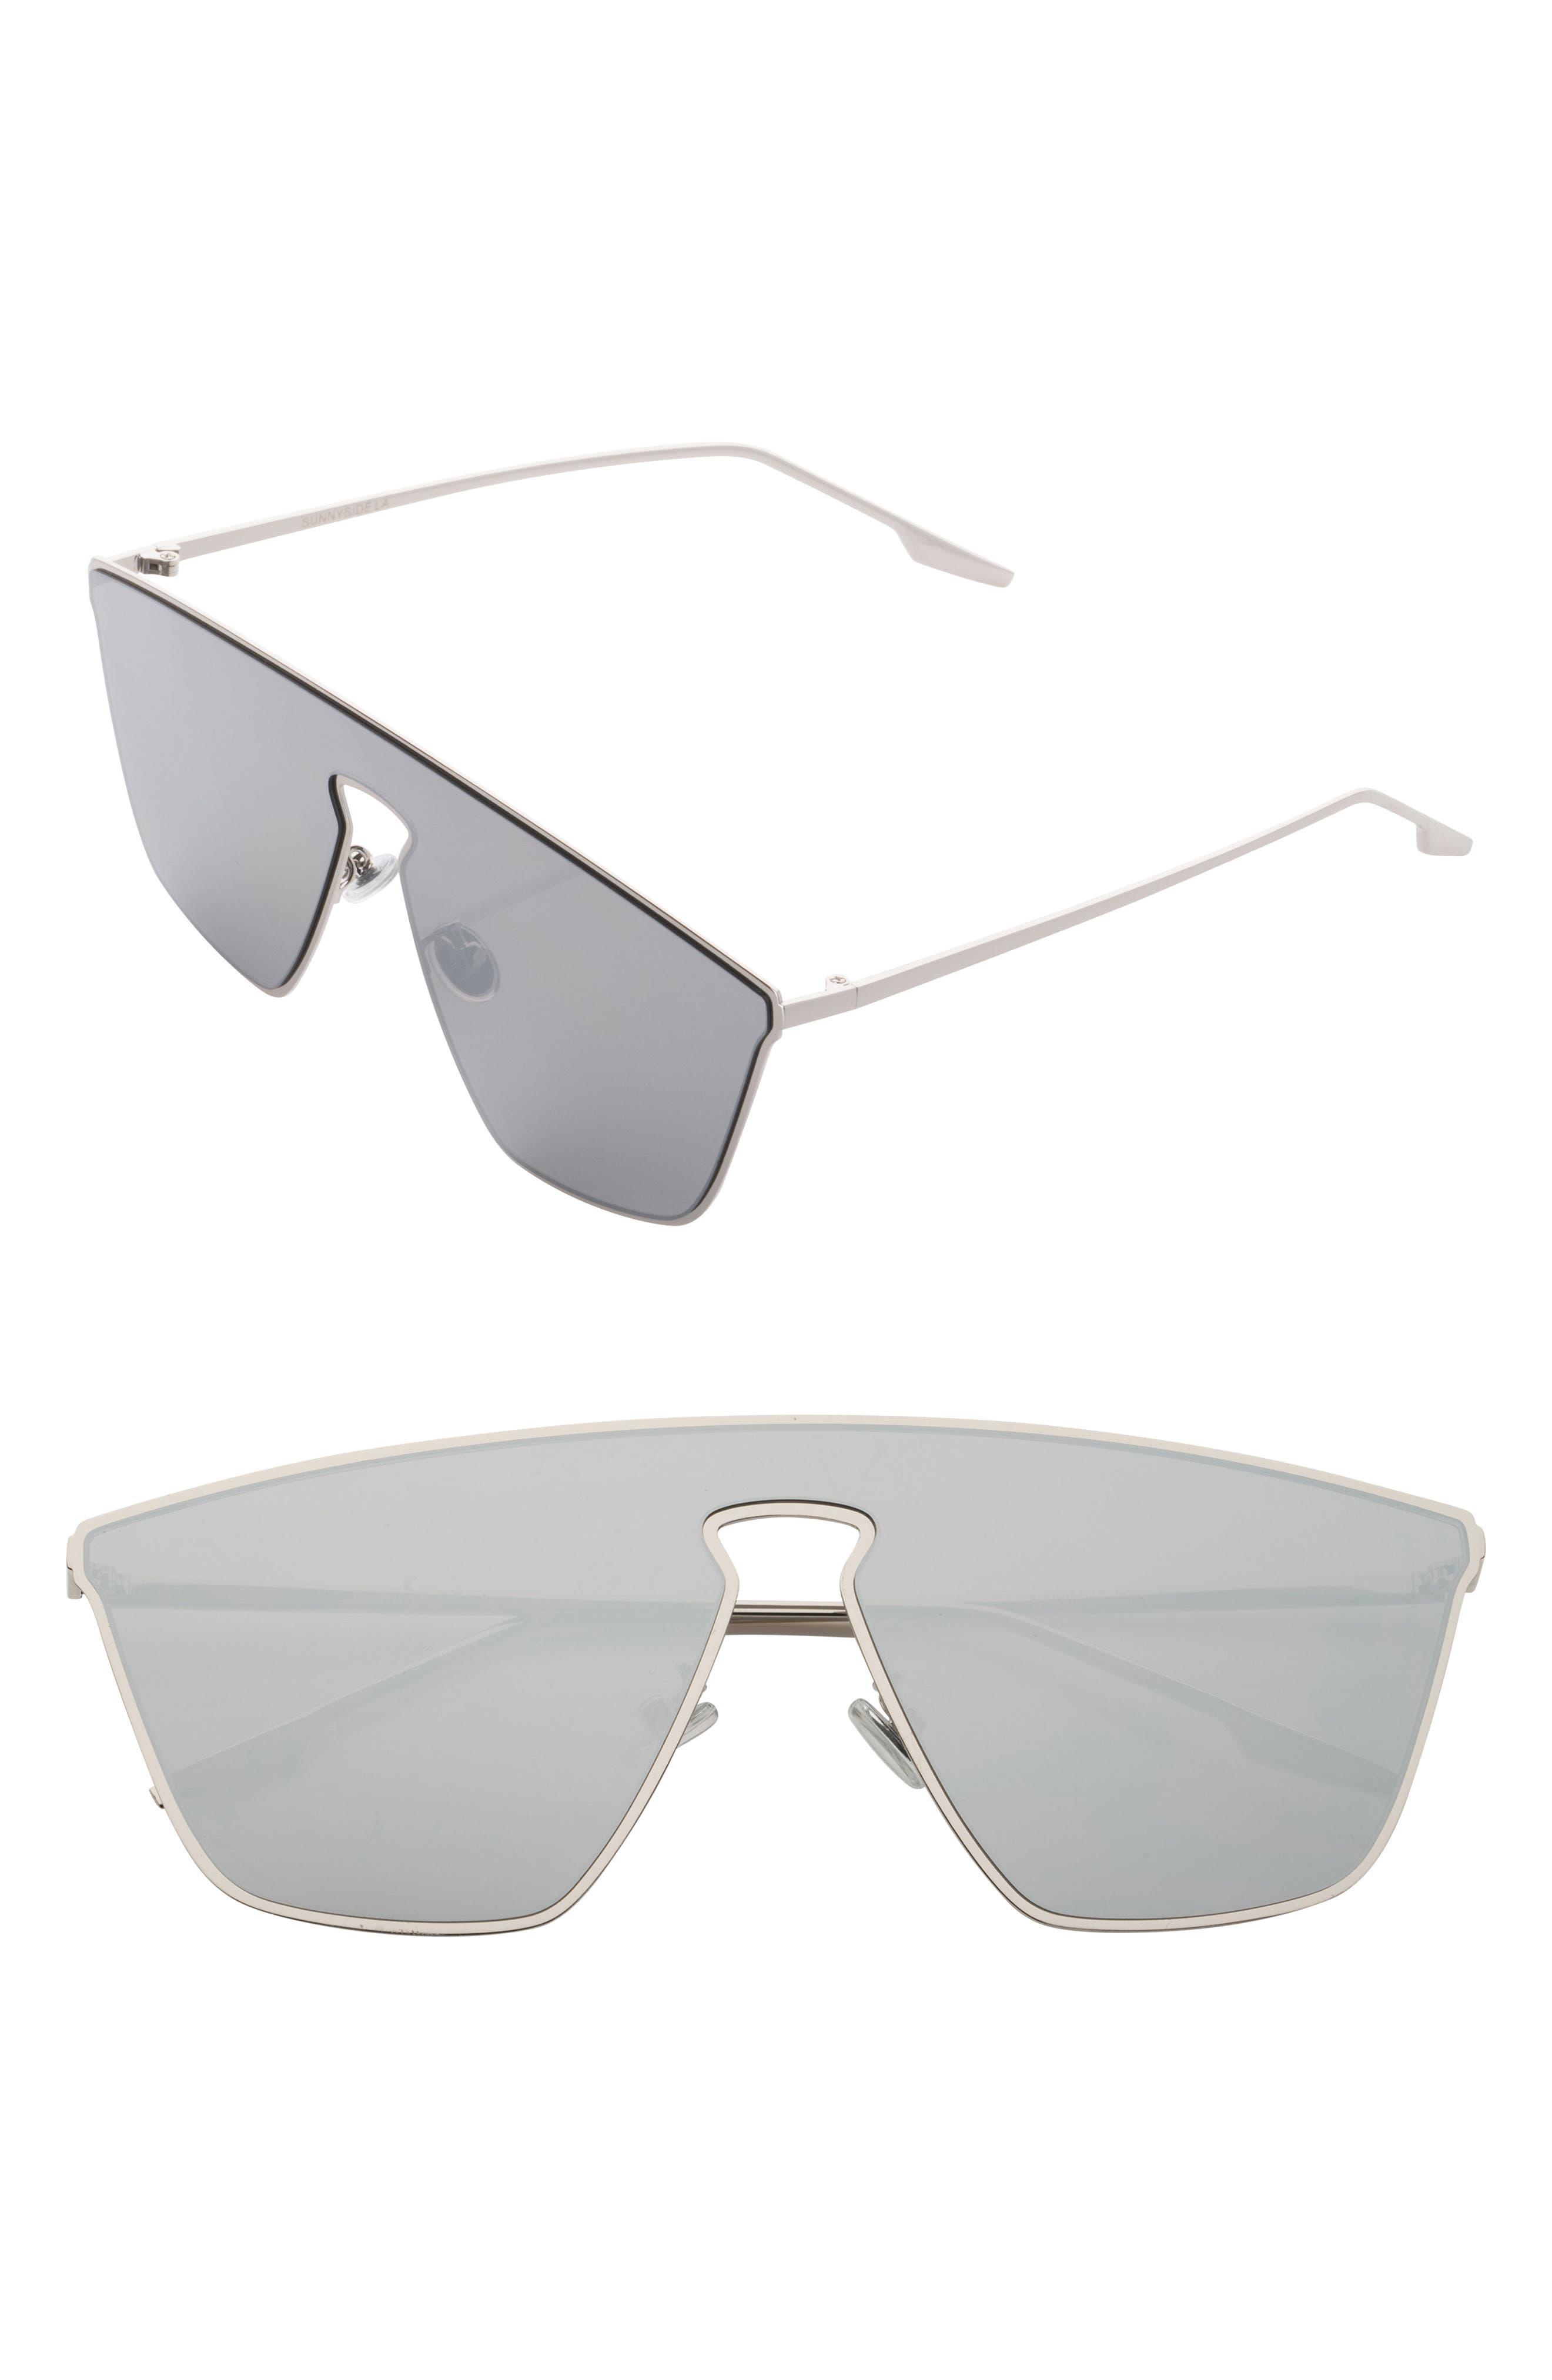 65mm Shield Sunglasses,                         Main,                         color, 040